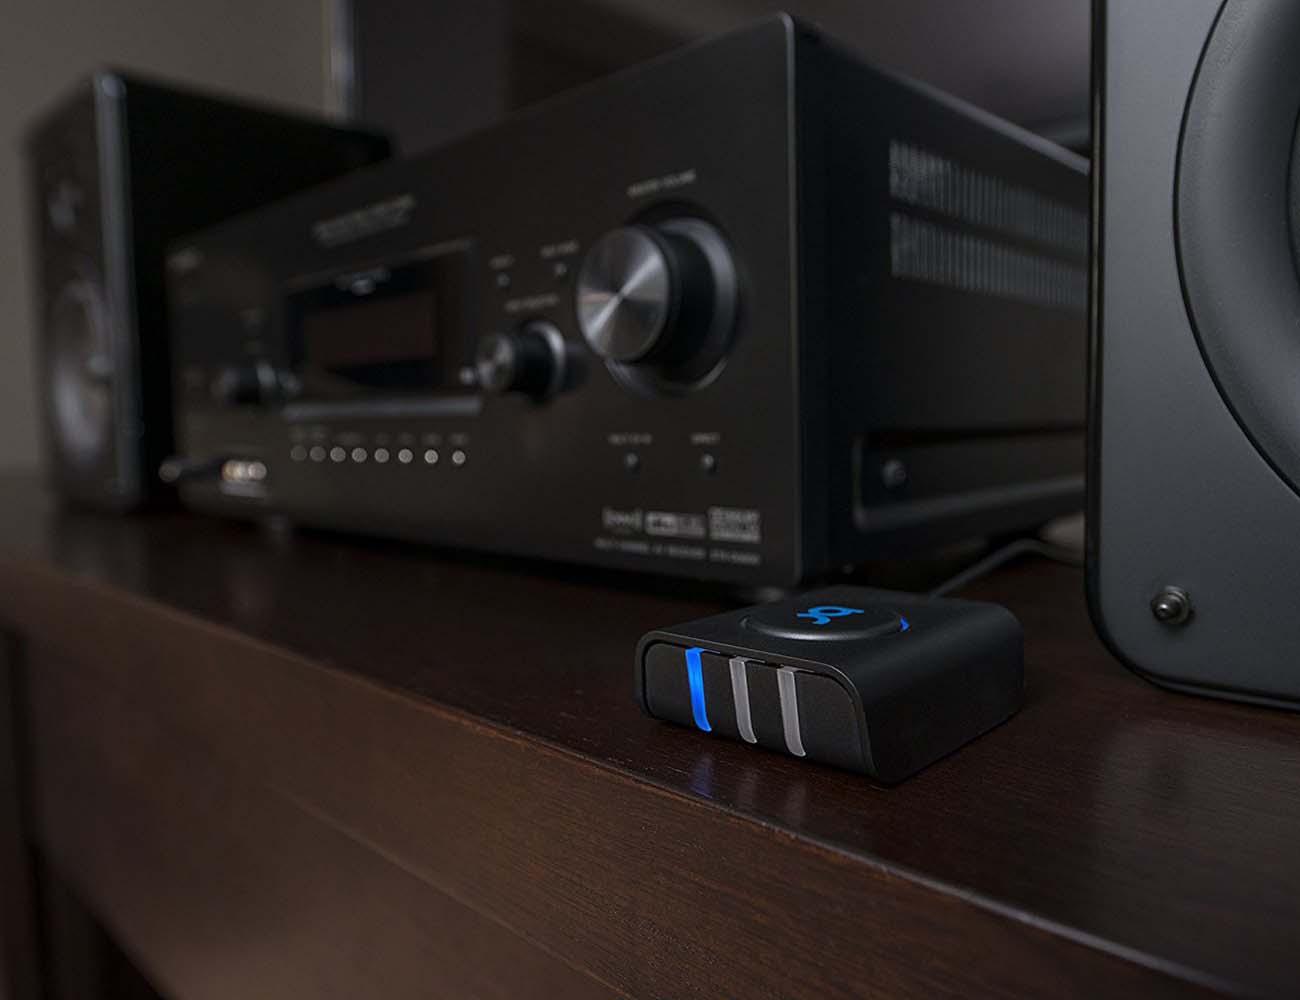 3Play – Bluetooth Audio Receiver